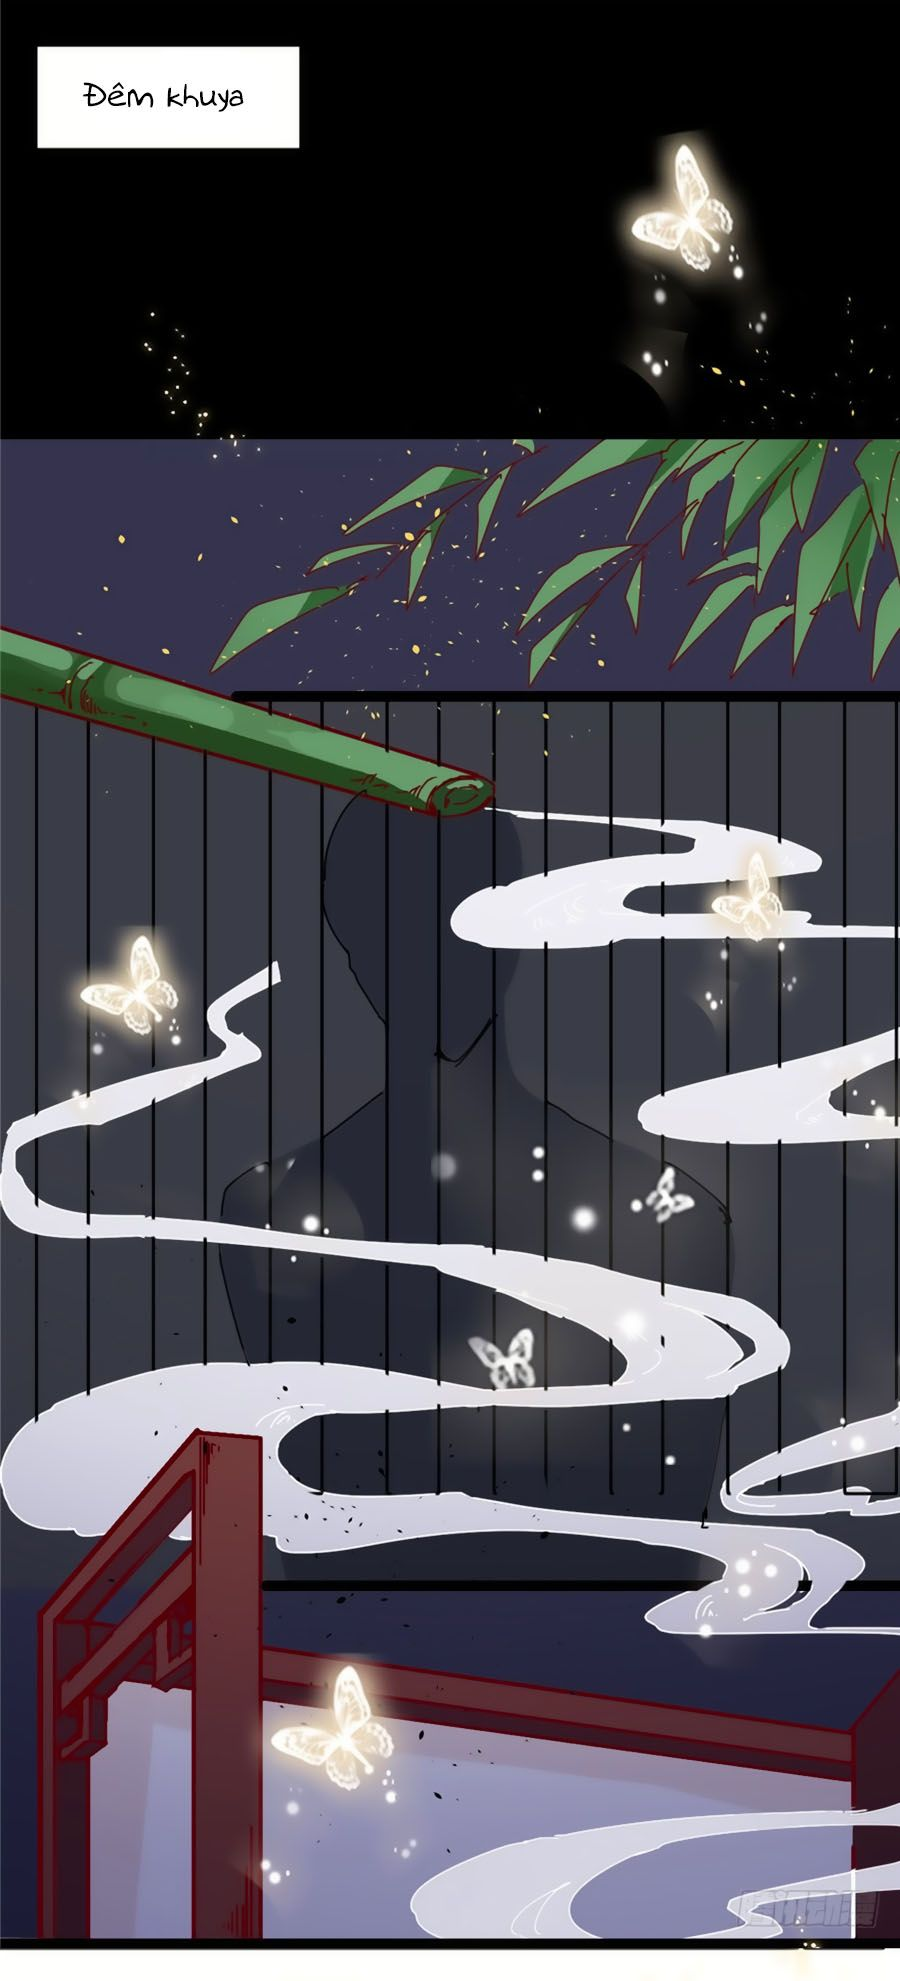 Ngọc Vi Mai chap 2 - Trang 1